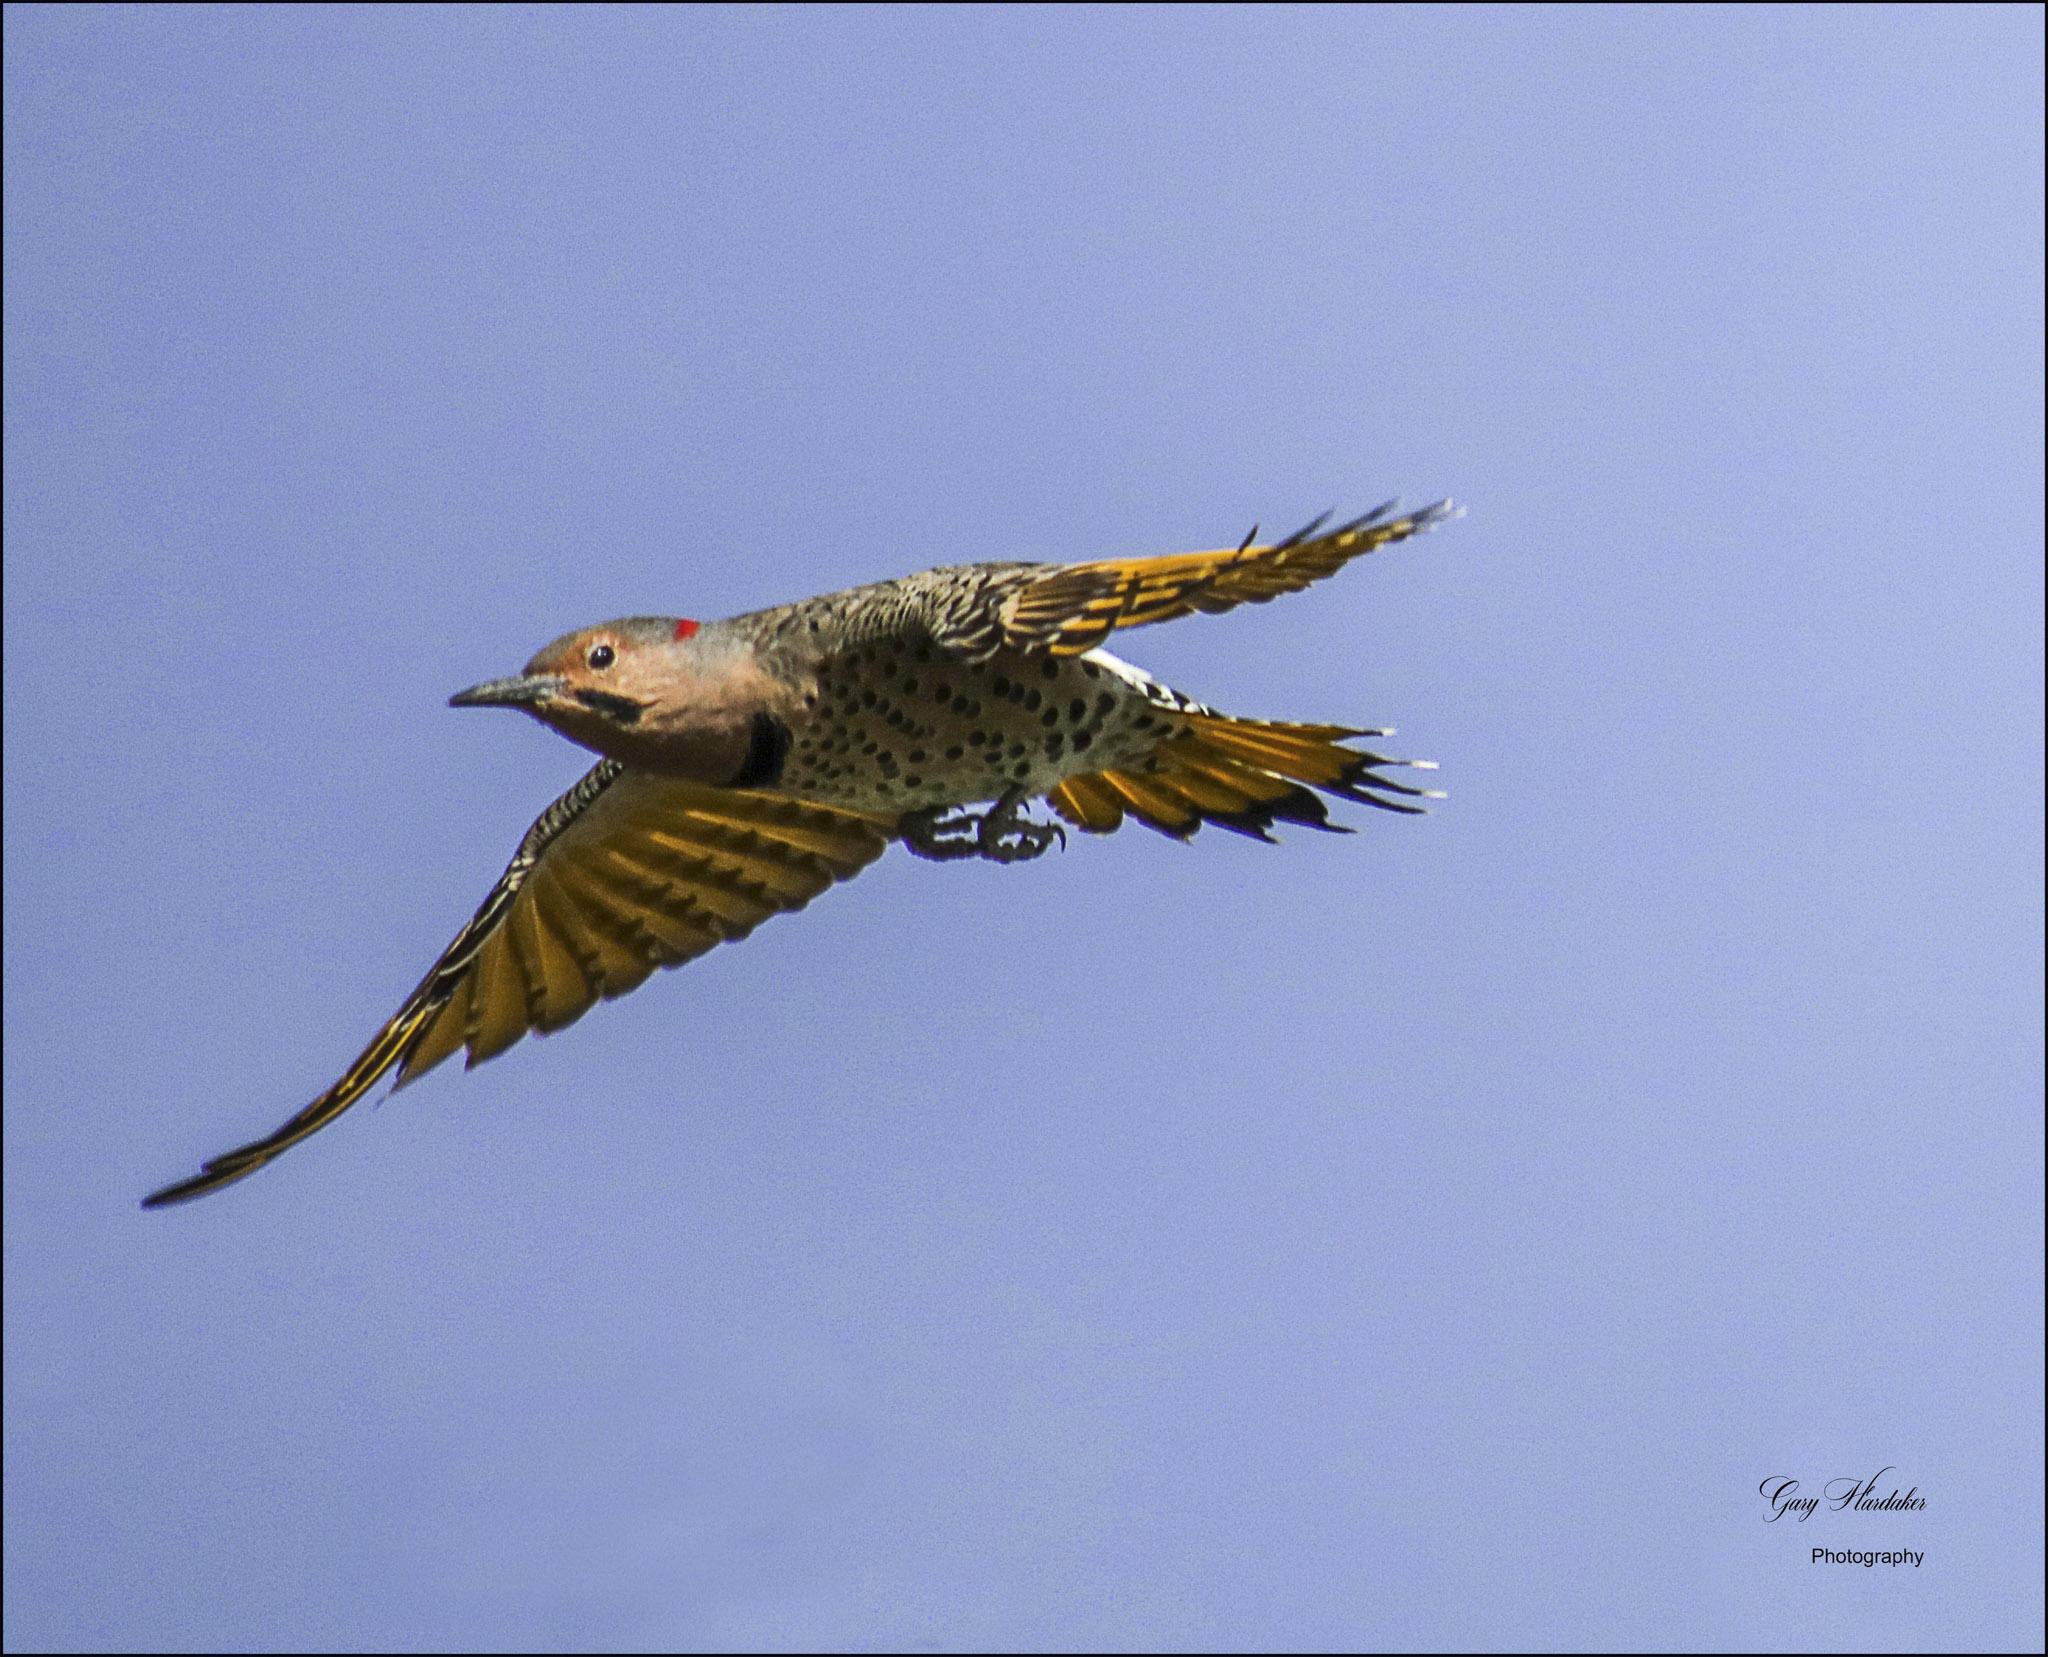 Yellow-Shafted Flicker in Flight - Gary Hardaker